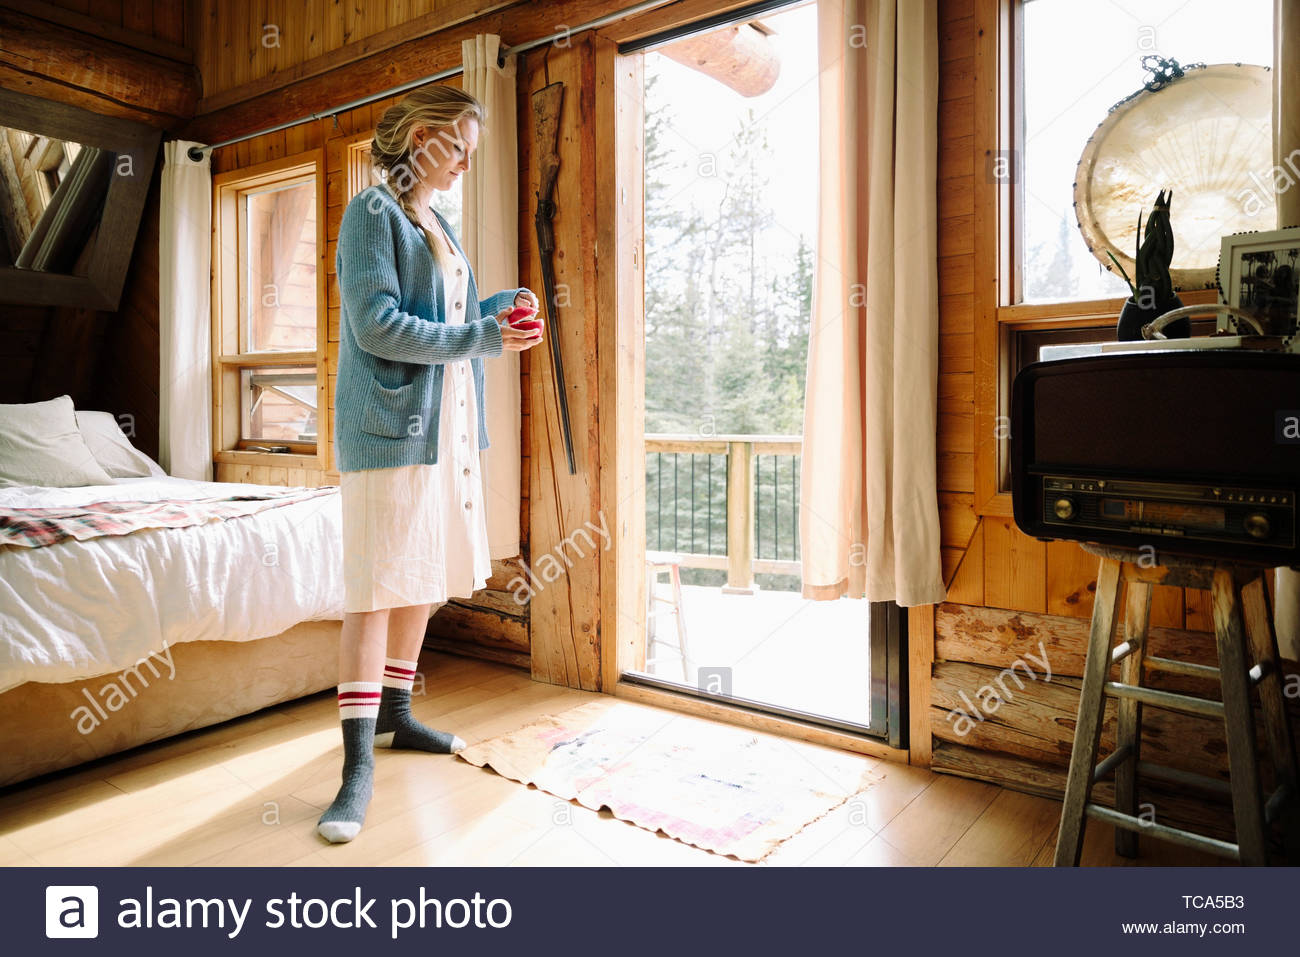 Woman eating apple en cabin Photo Stock